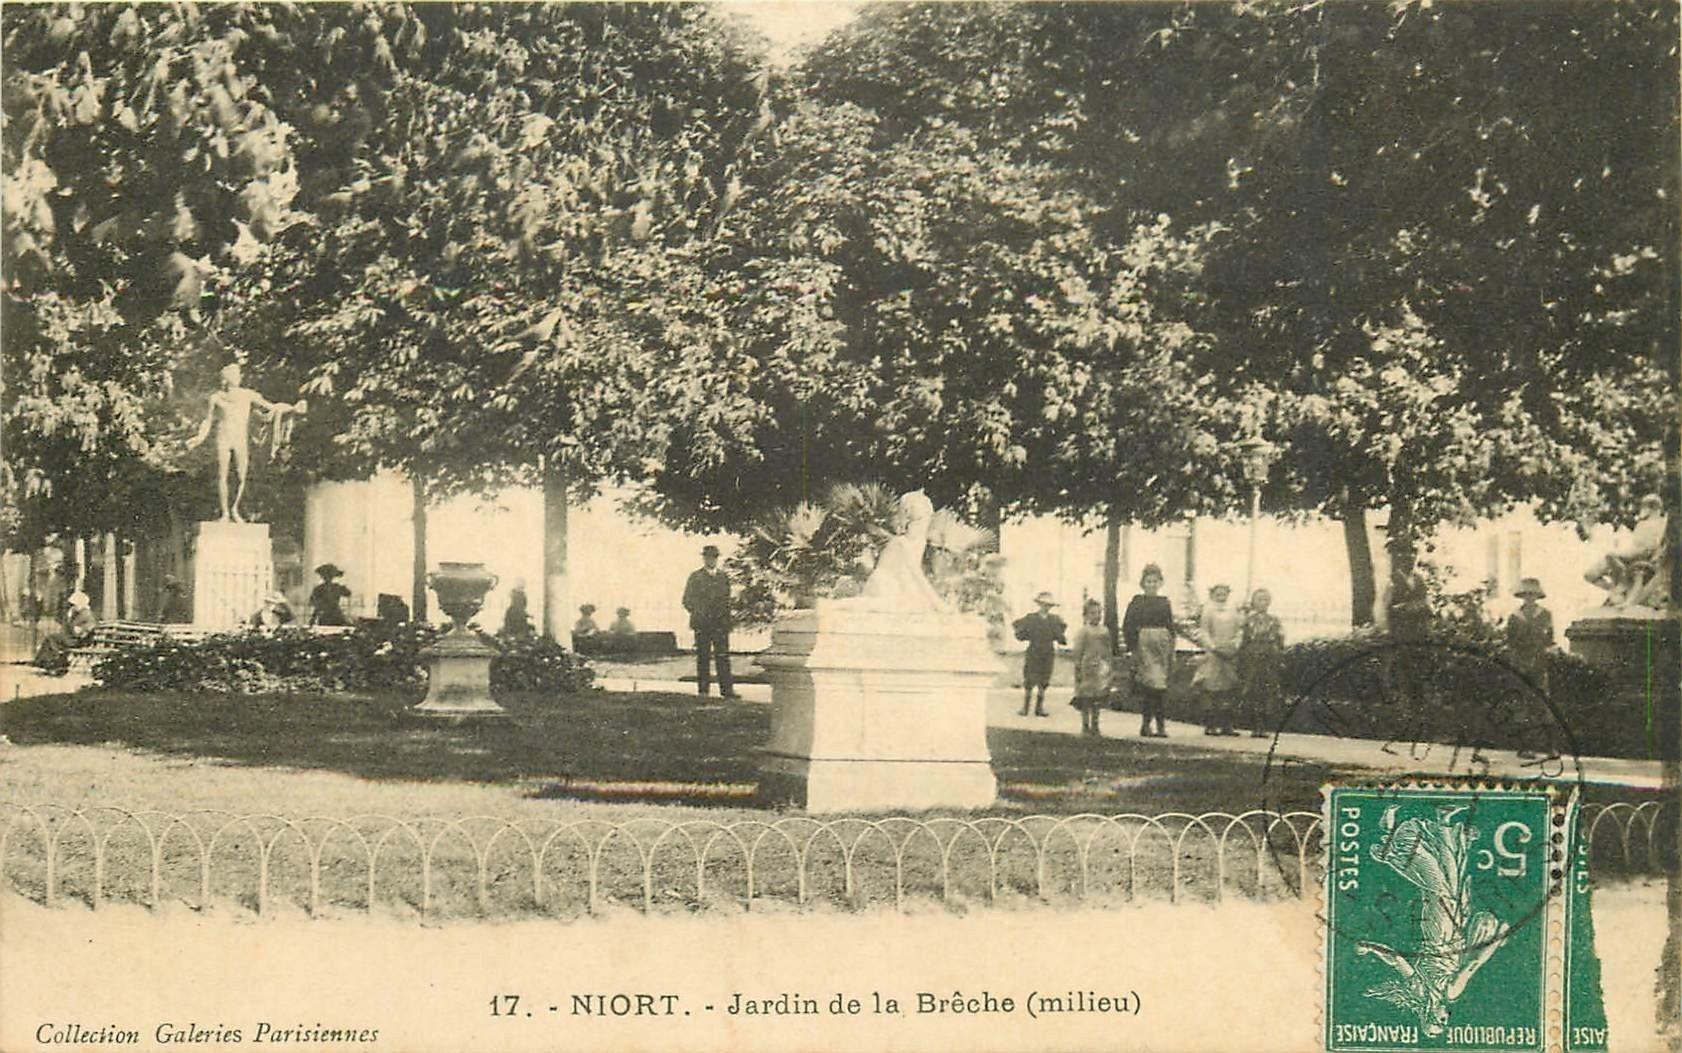 79 niort jardin de la br che 1911 for Jardin royal niort